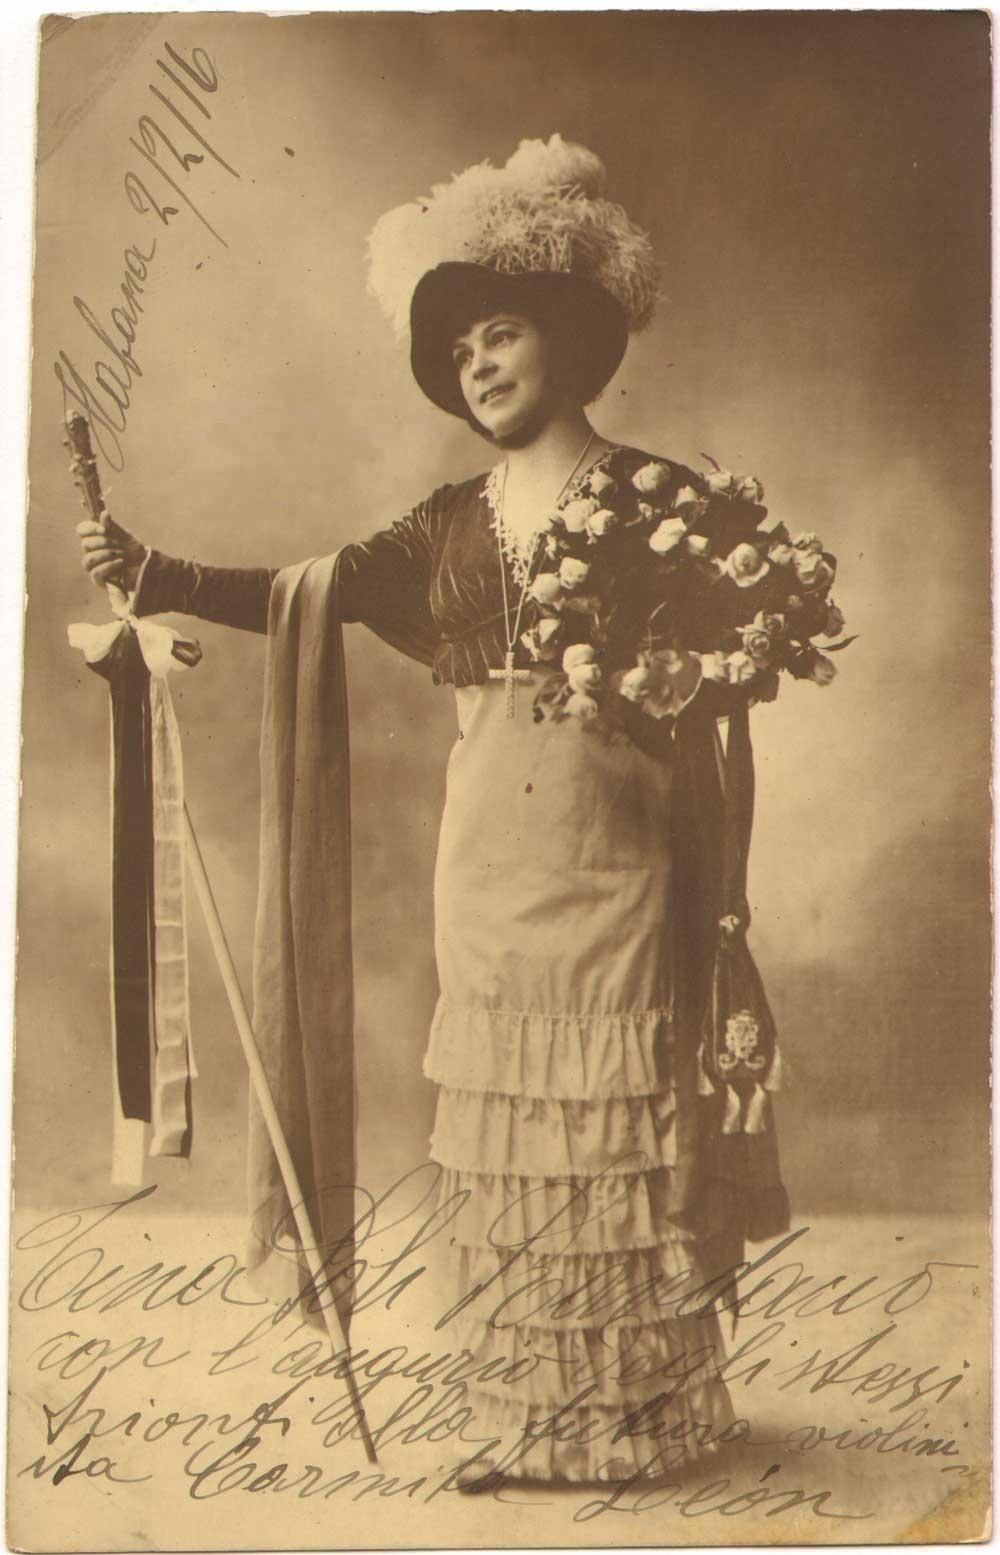 GREAT ITALIAN SOPRANO TINA POLI RANDACCIO (1879 - 1956) CD